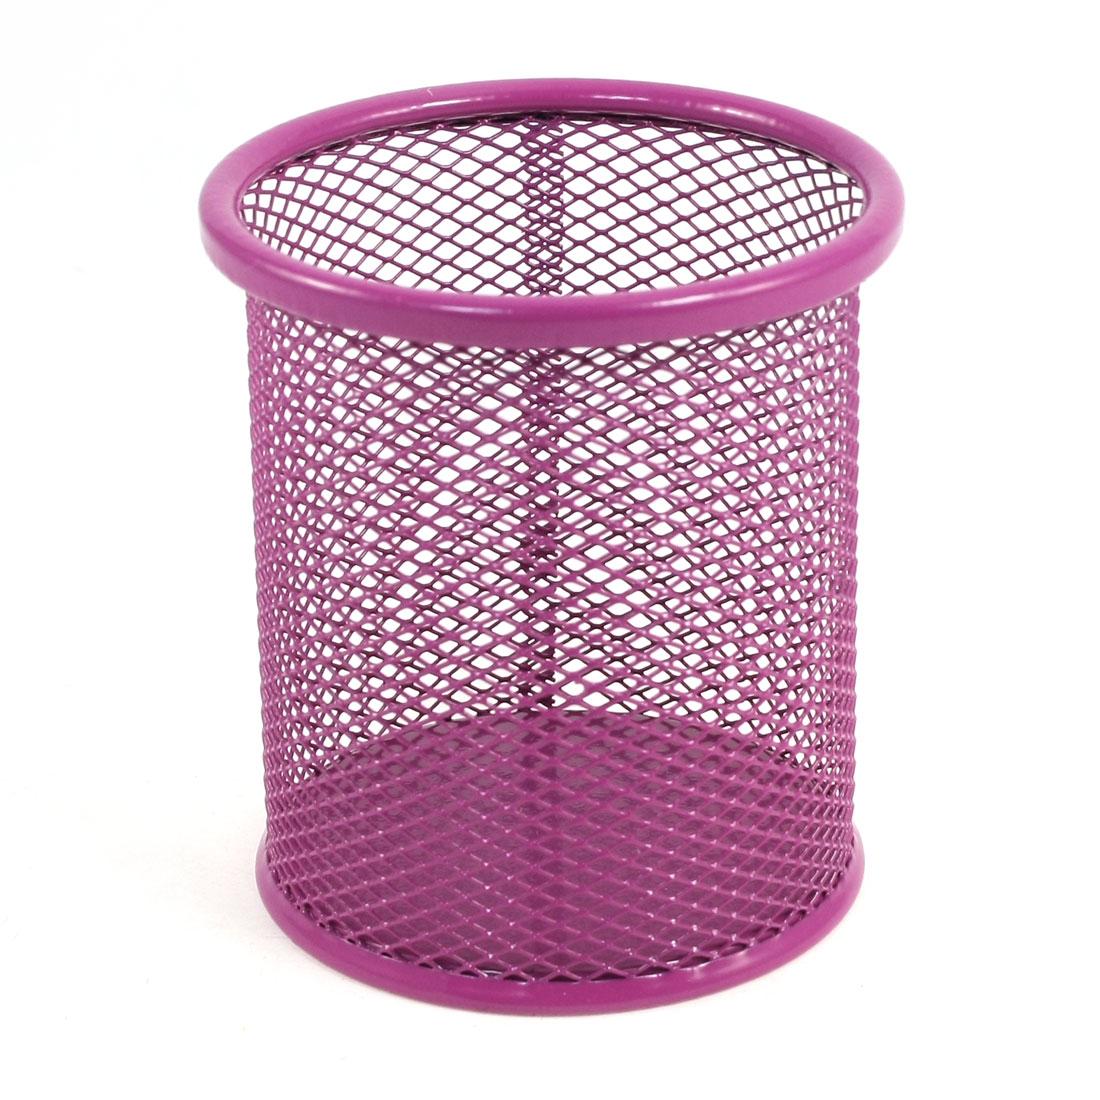 Metallic Mesh Cylinder Shape Stationery Holder Box Container Fuchsia